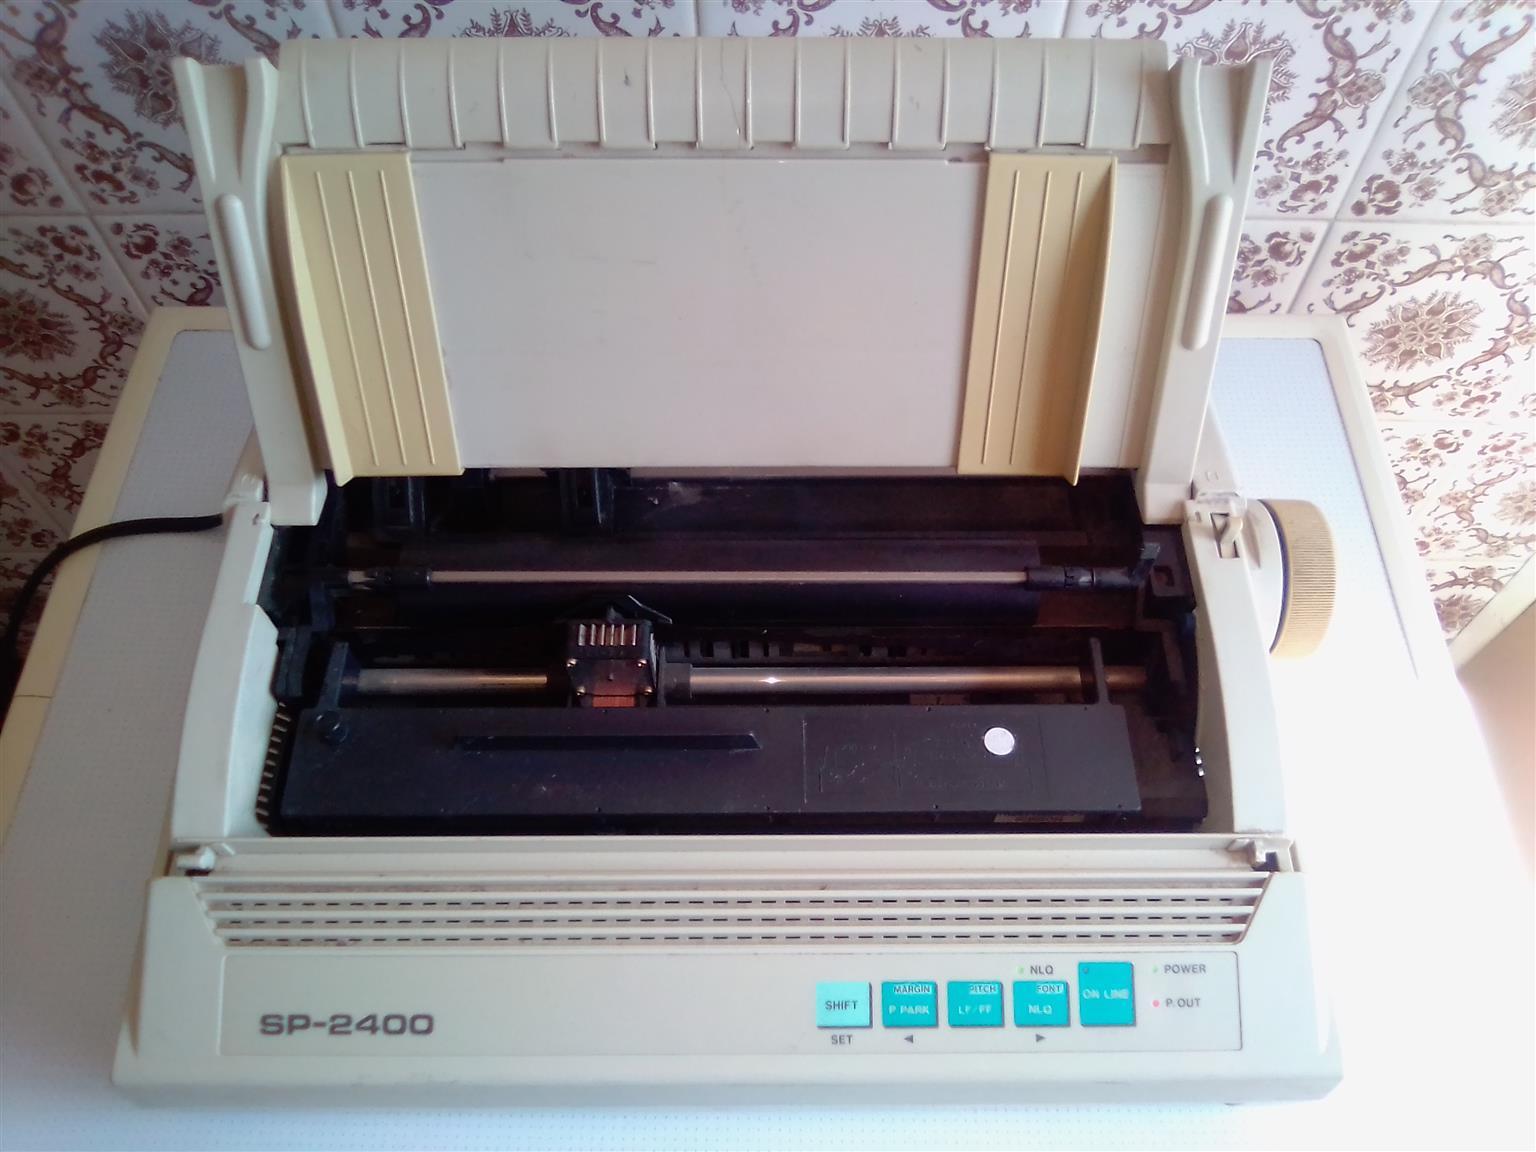 Seikosha SP 2400  Dot Matrix Printer. In good working condition.